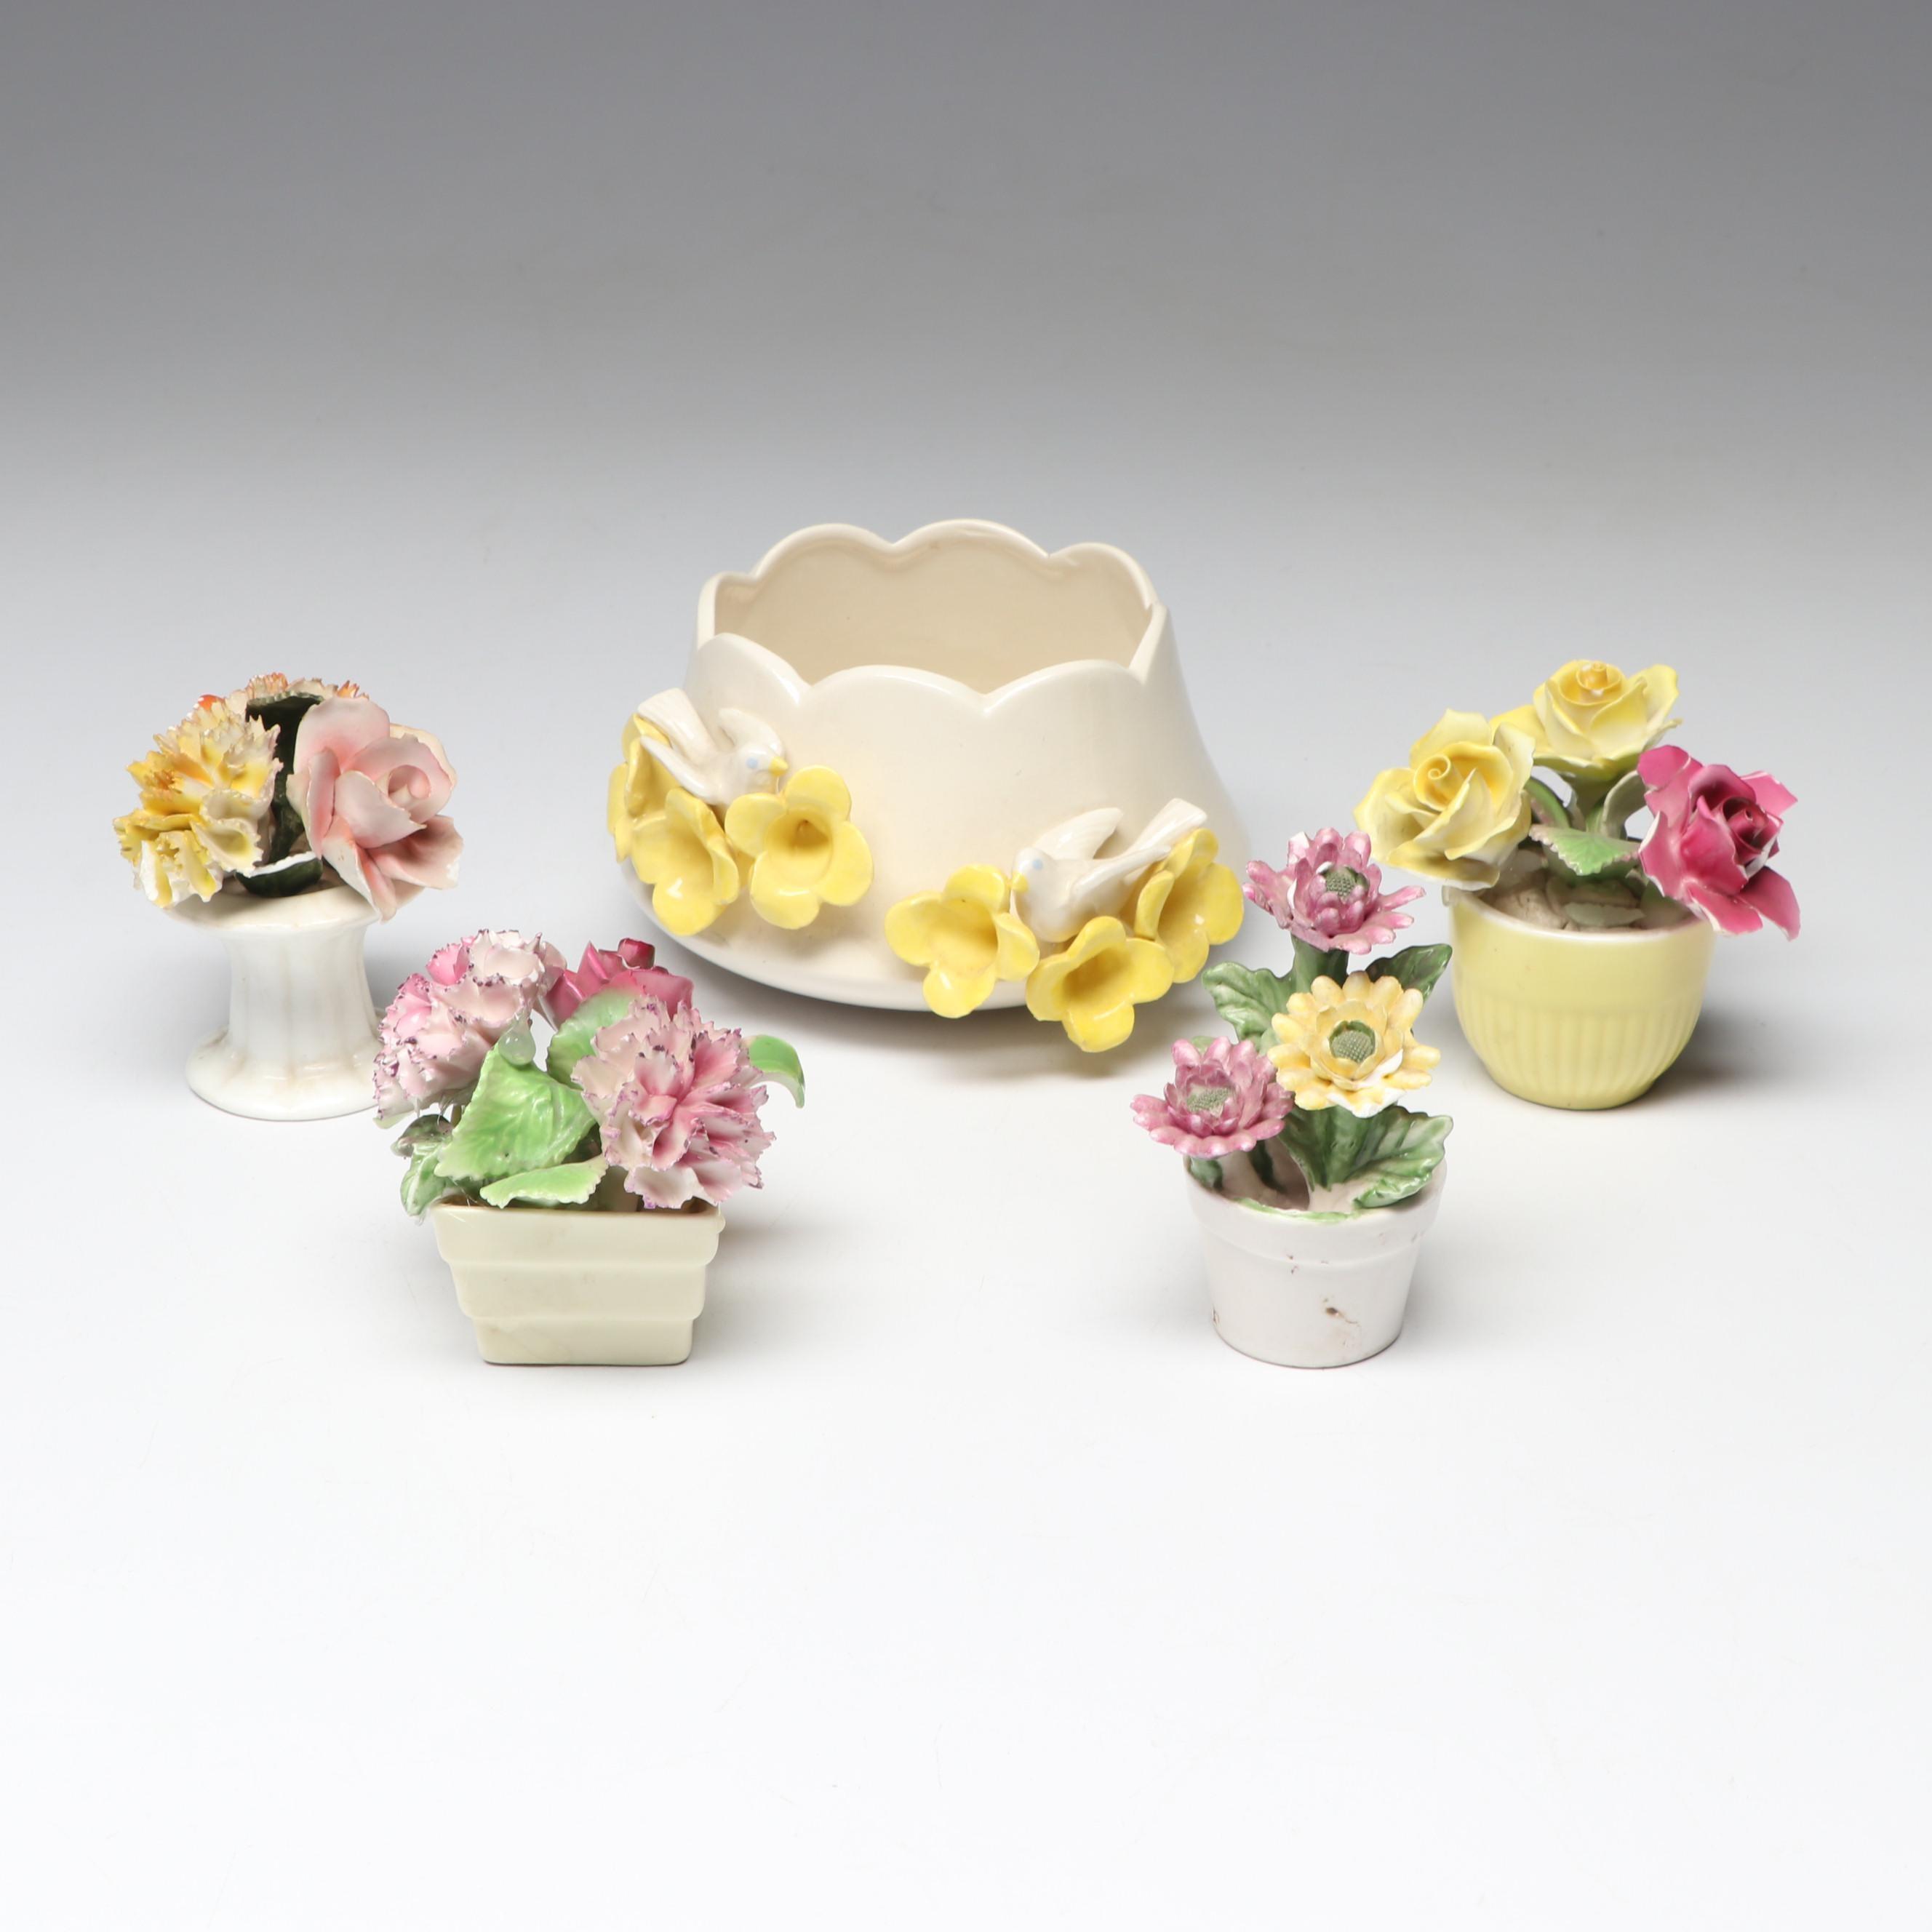 Lefton, Staffordshire and Other Porcelain Floral Decor